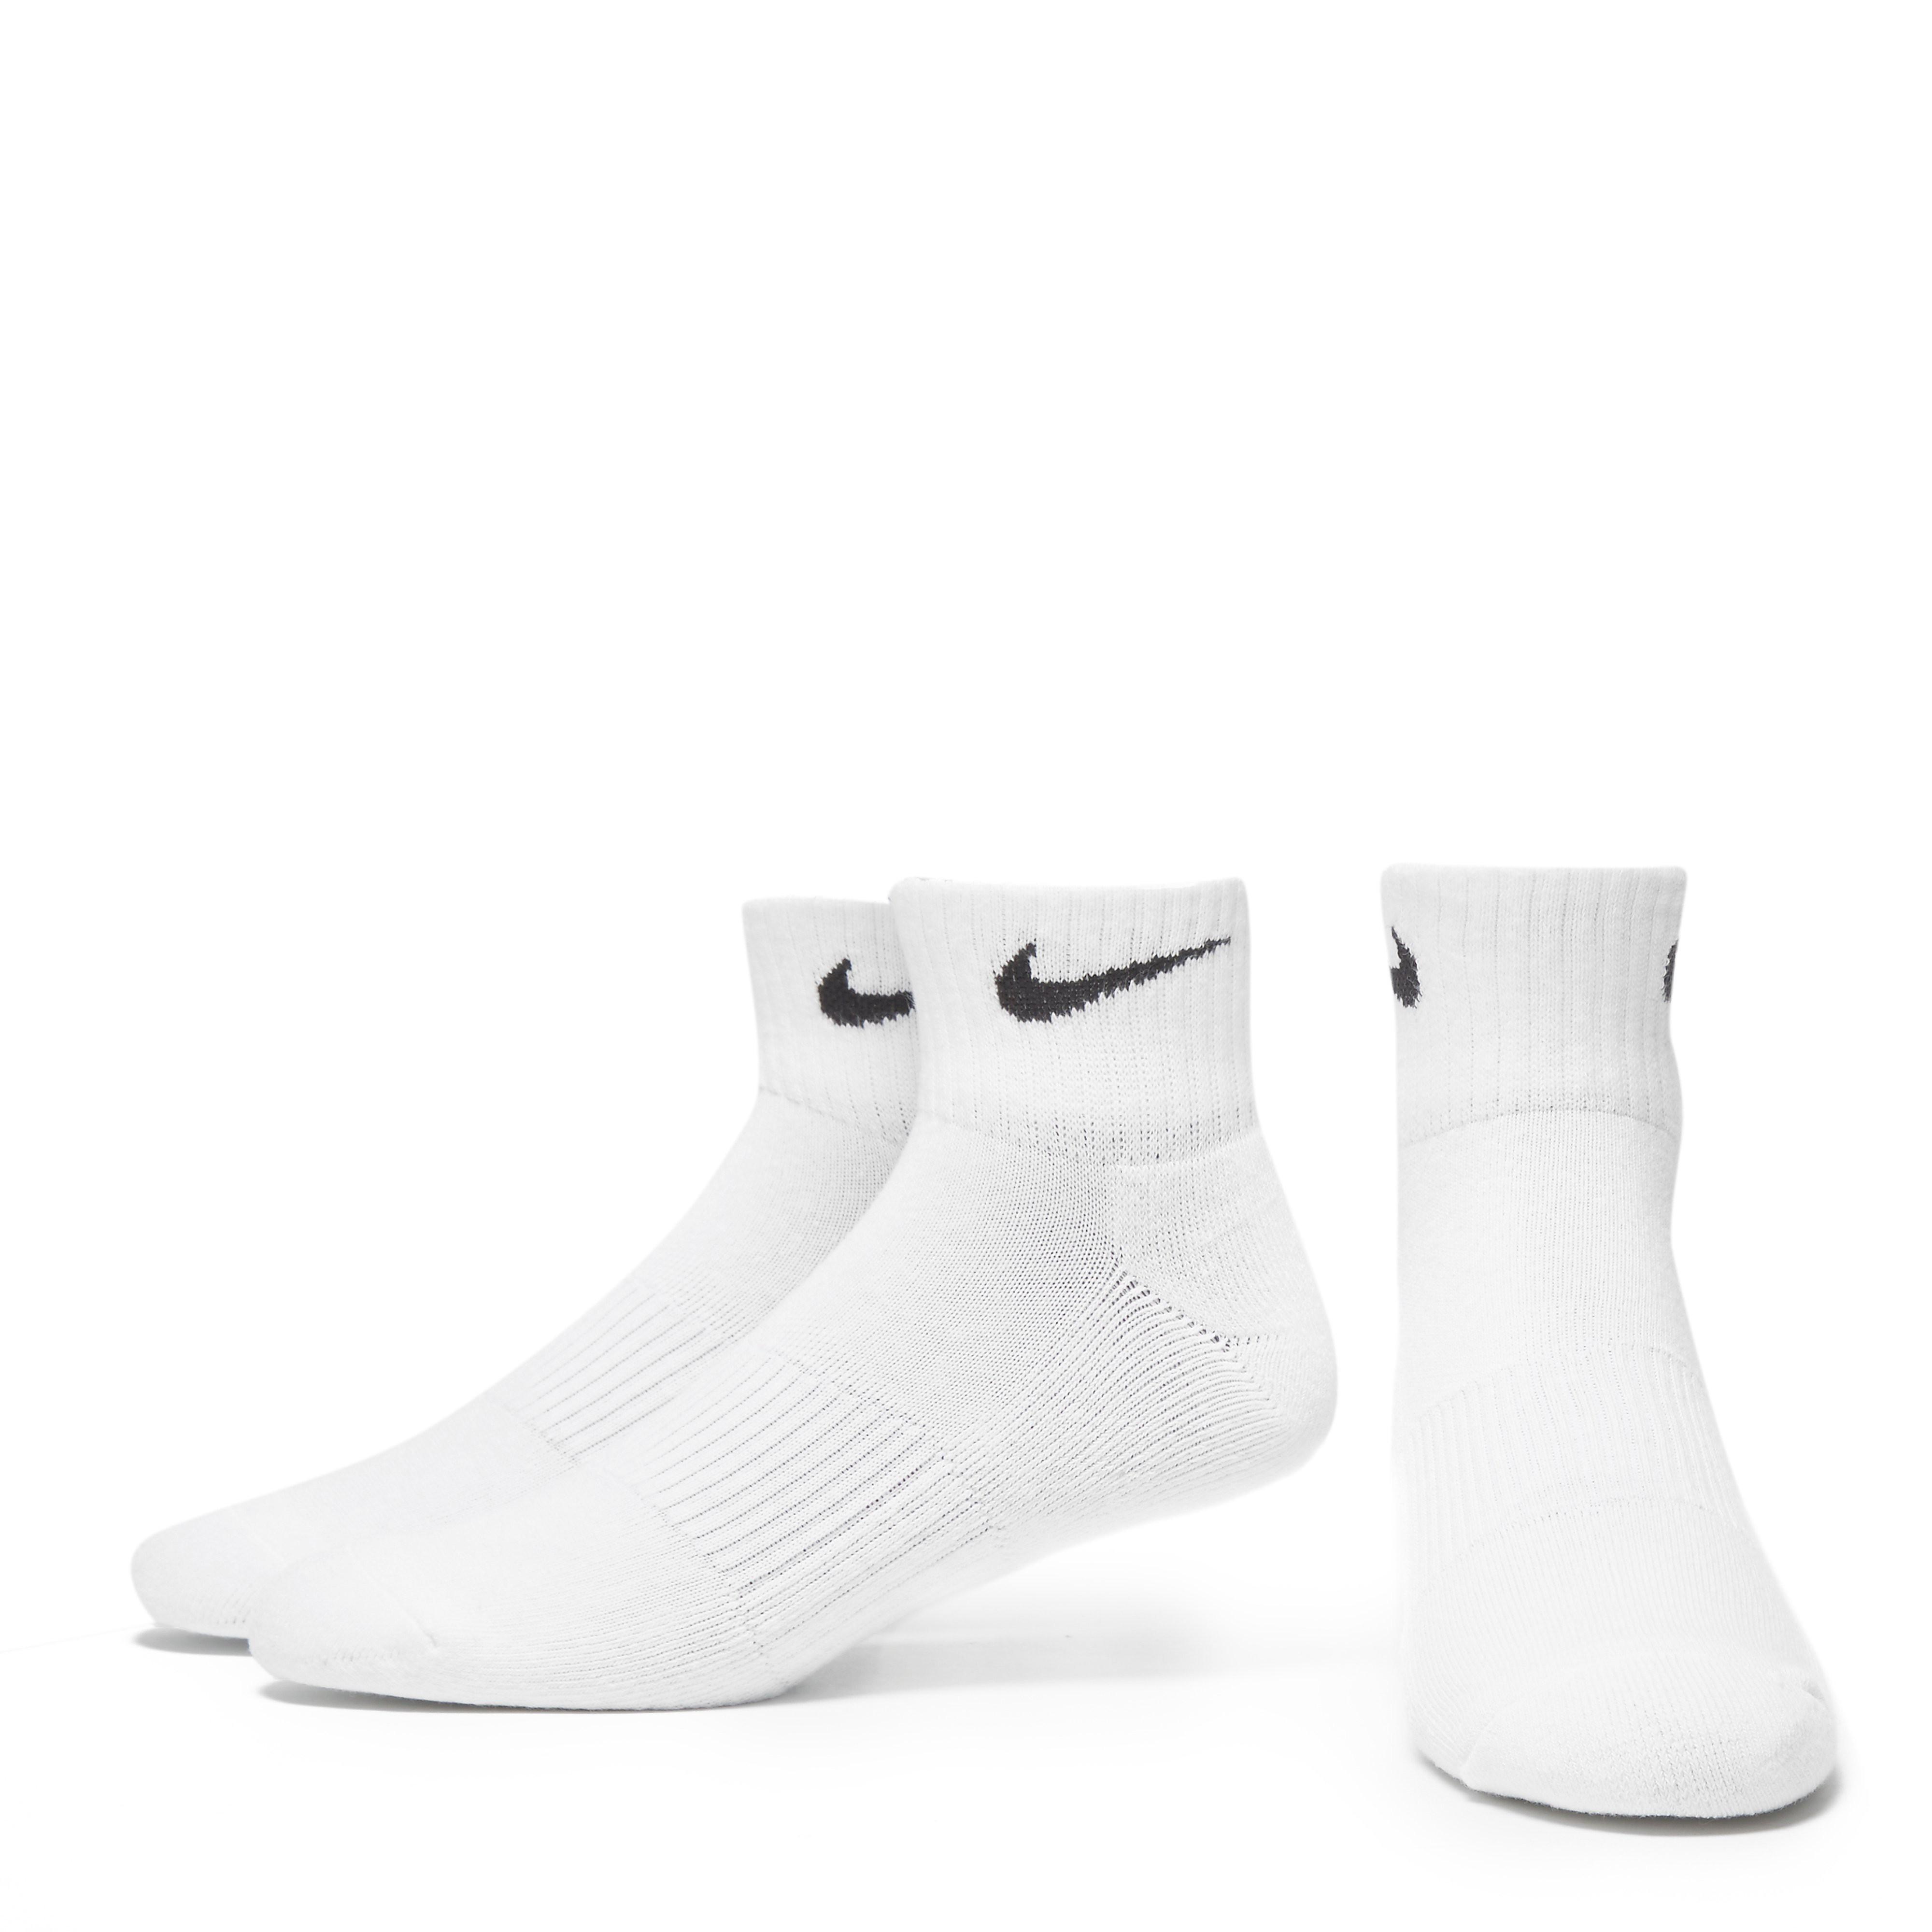 Nike Cotton Cushion Quarter Socks (3 Pack)